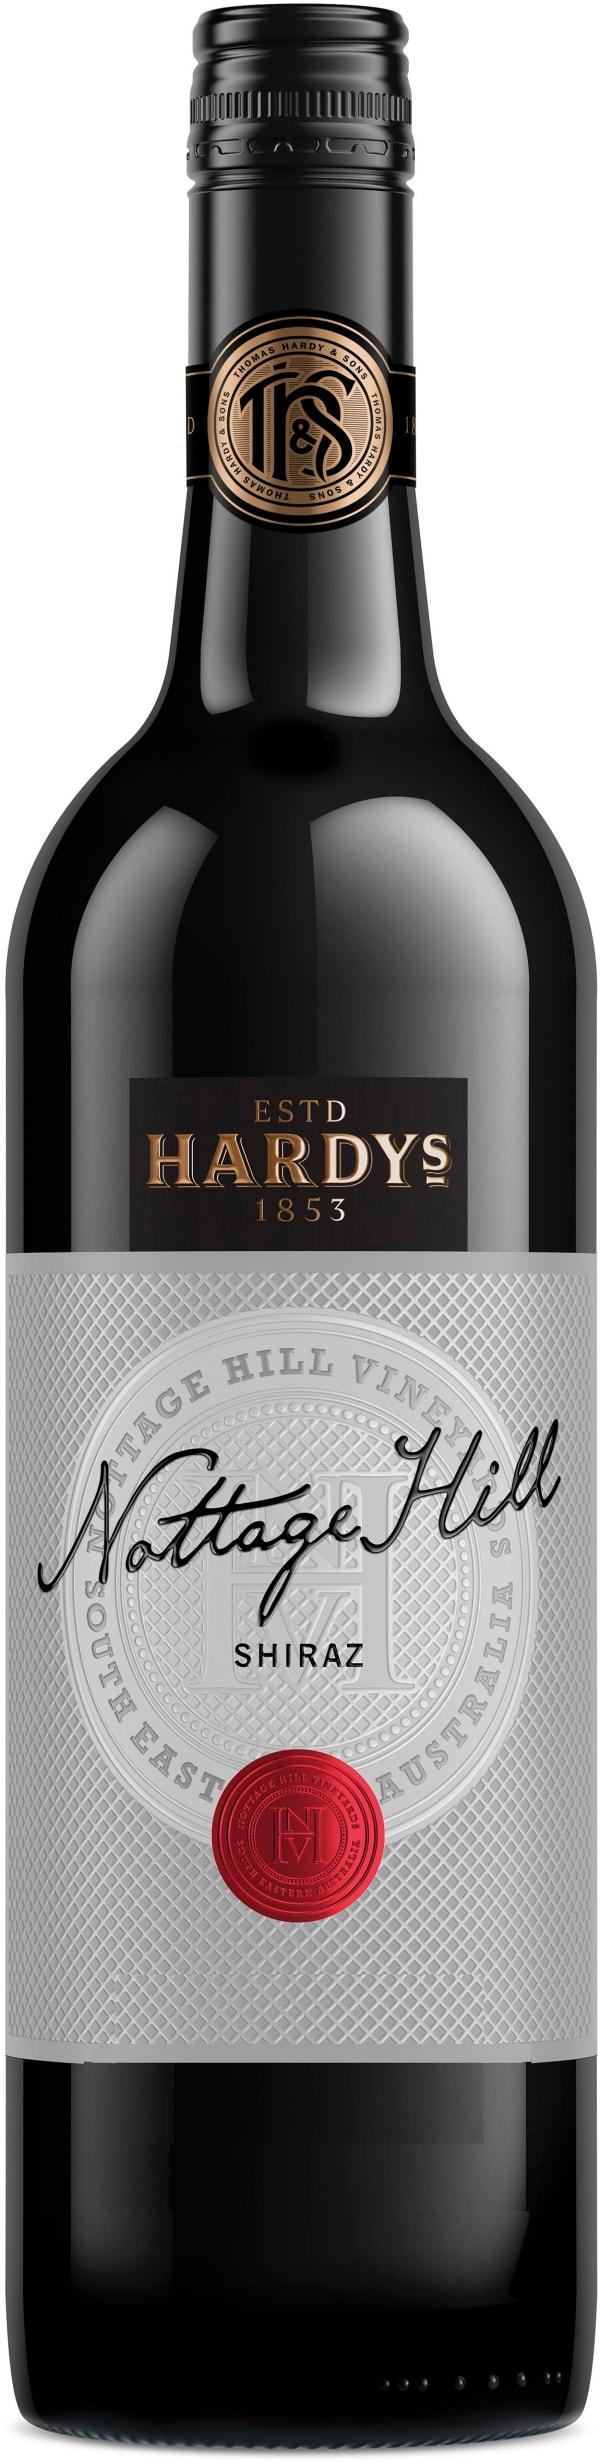 Hardys Nottage Hill Shiraz 2017